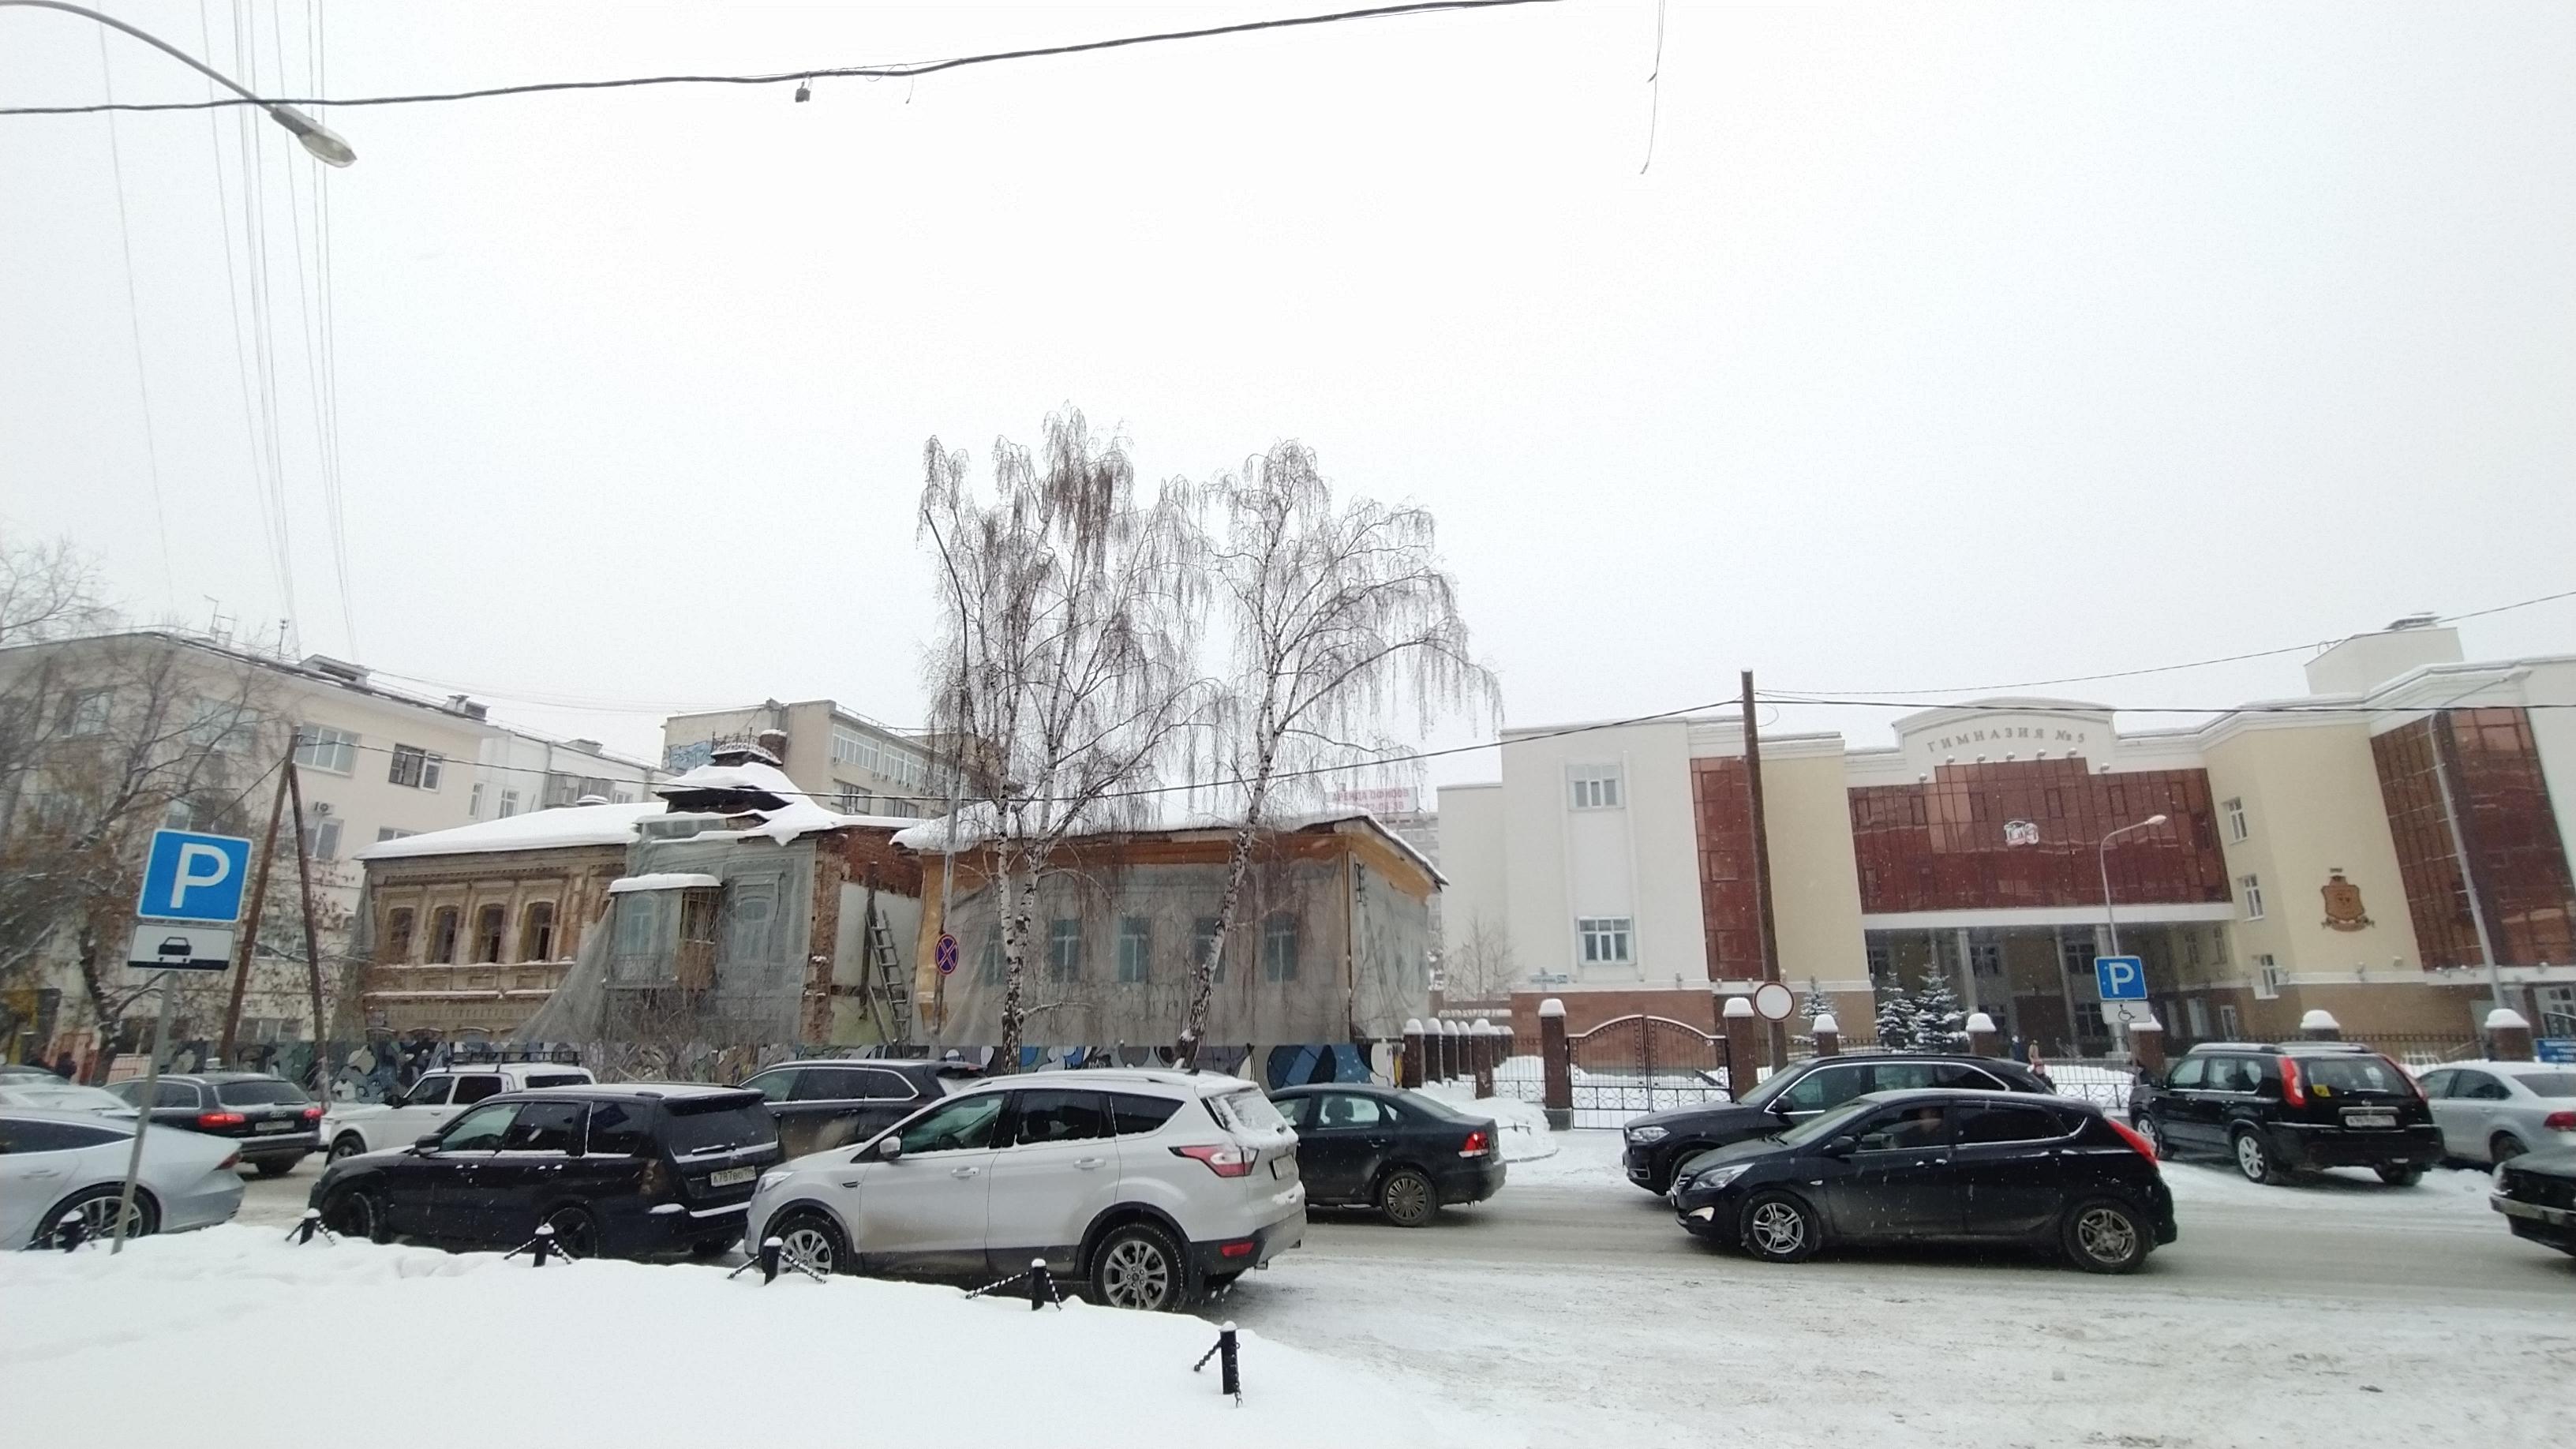 Фото: Григорий Постников/ РБК Екатеринбург